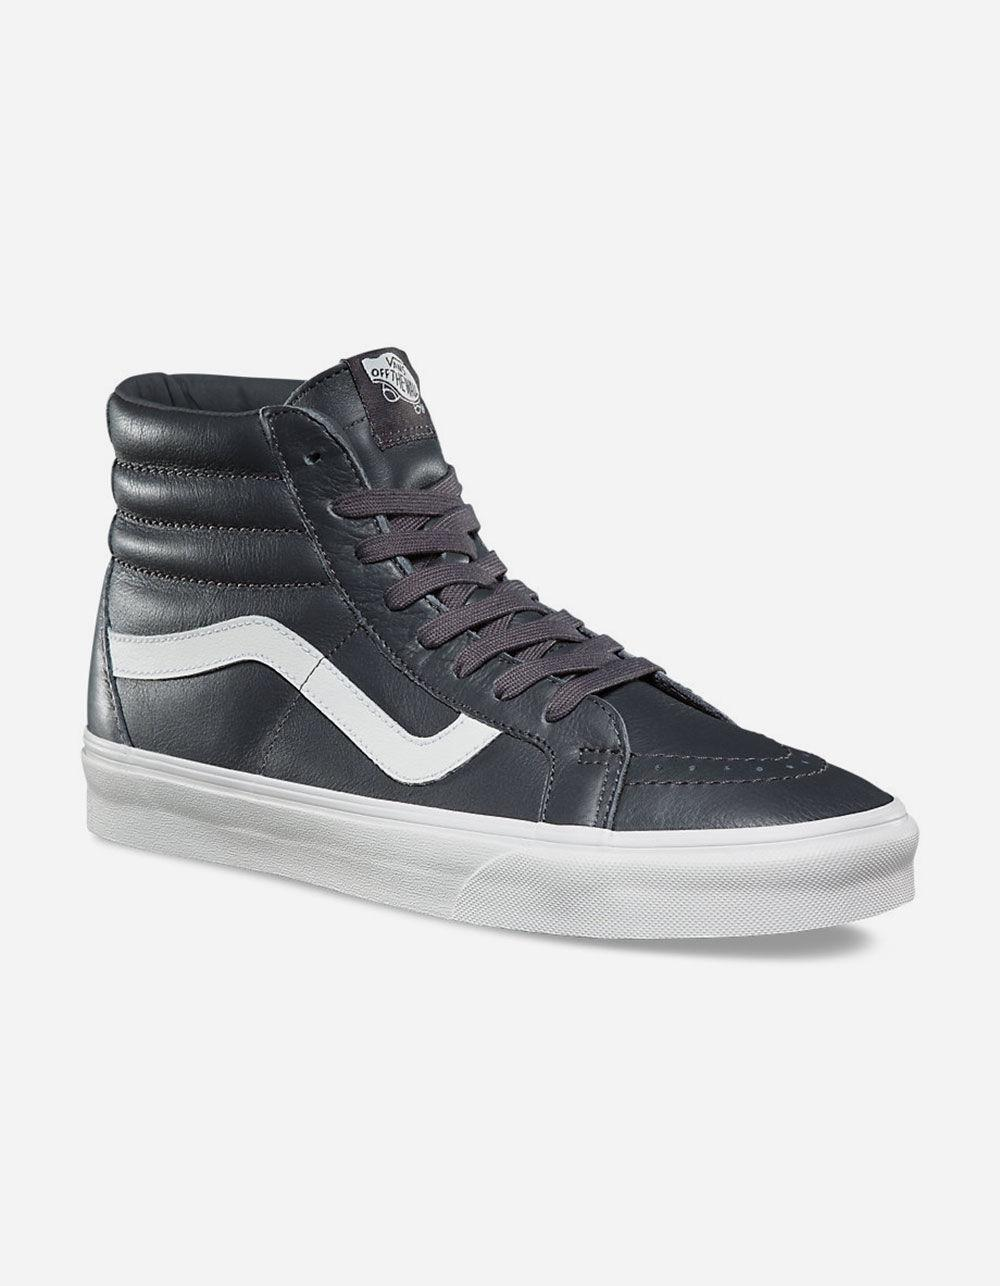 65378068870b Lyst - Vans Sk8-hi Reissue Leather Asphalt   Blanc De Blanc Shoes in Gray  for Men